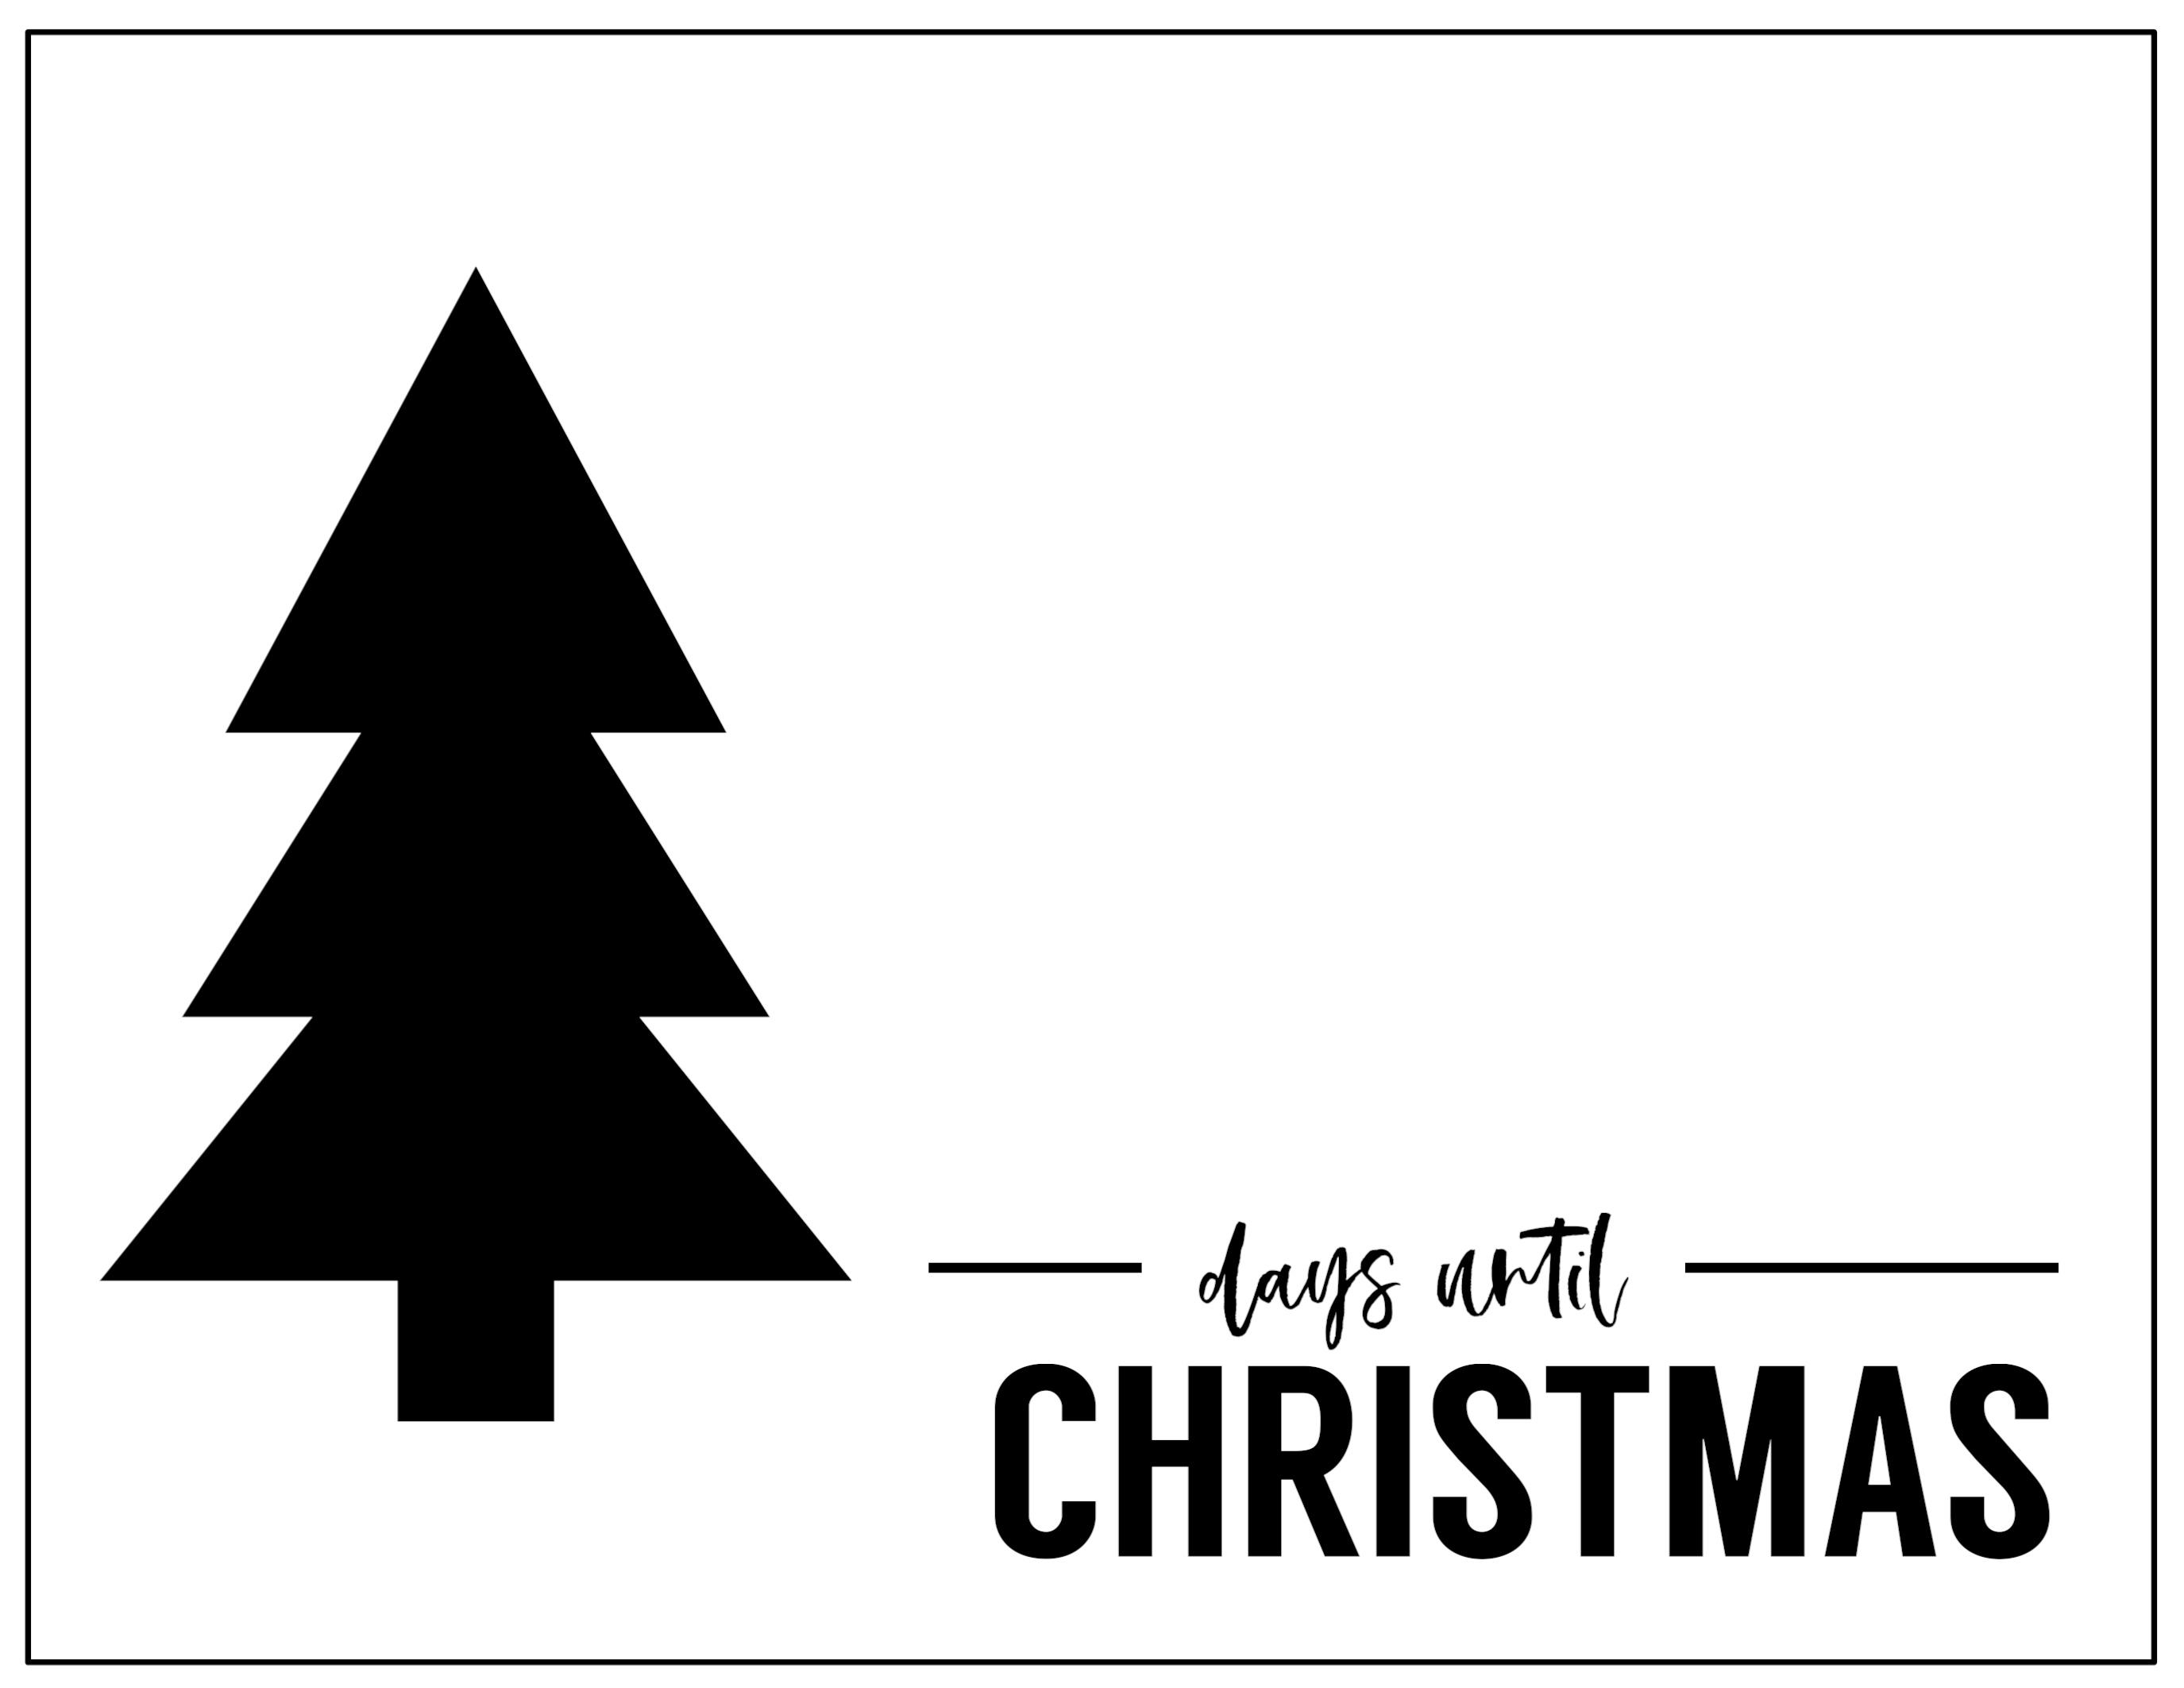 Free Printable Days Until Christmas Countdown - Paper Trail Xmas Countdown 2020 Clendar Printable